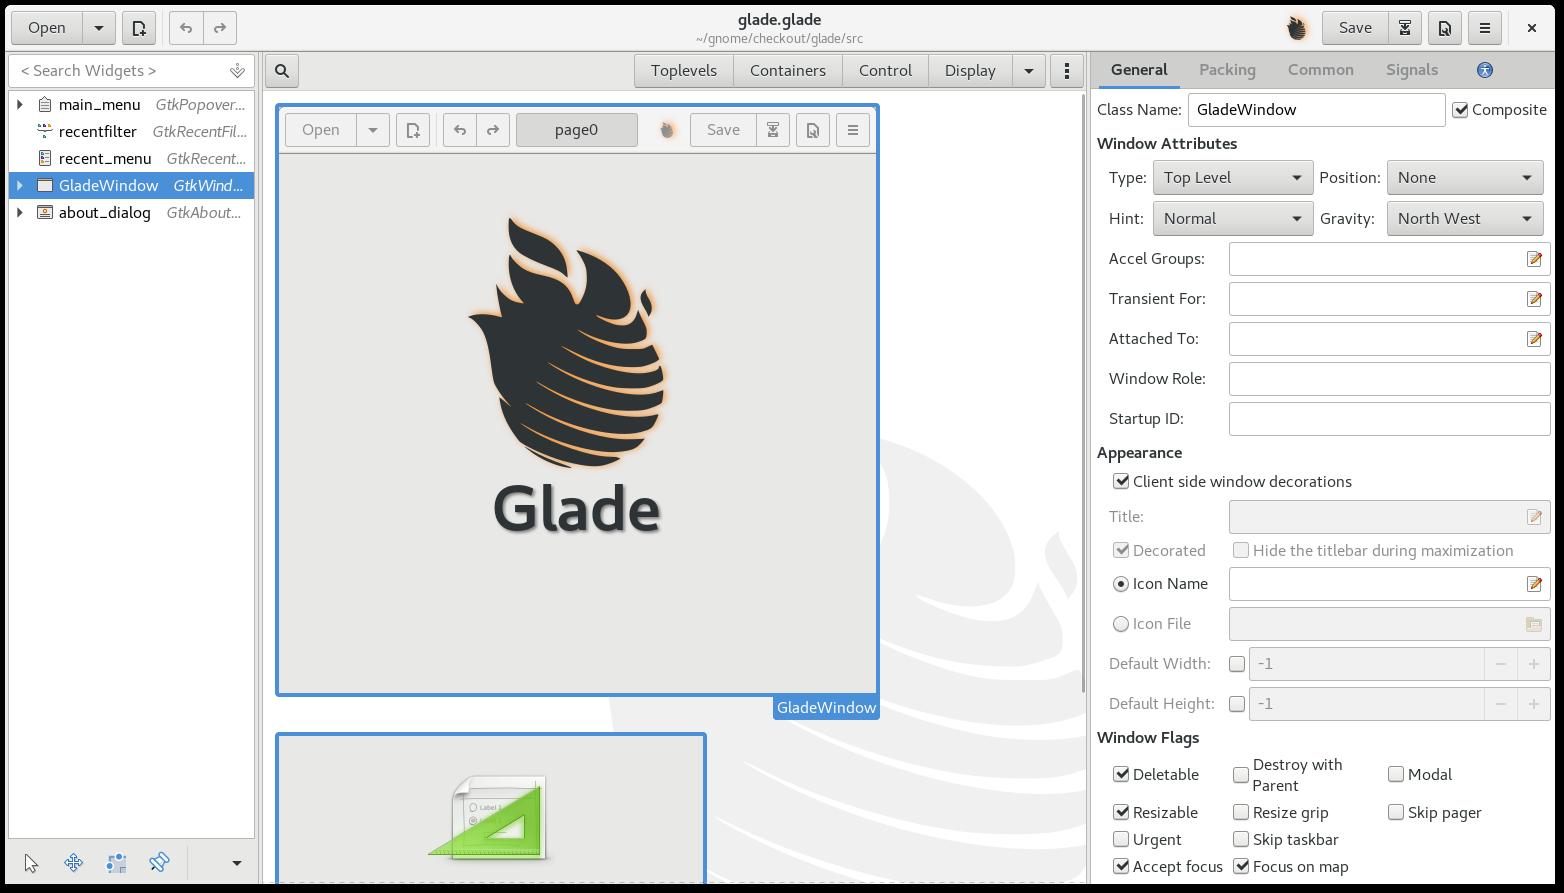 Integration of Glade and GTK